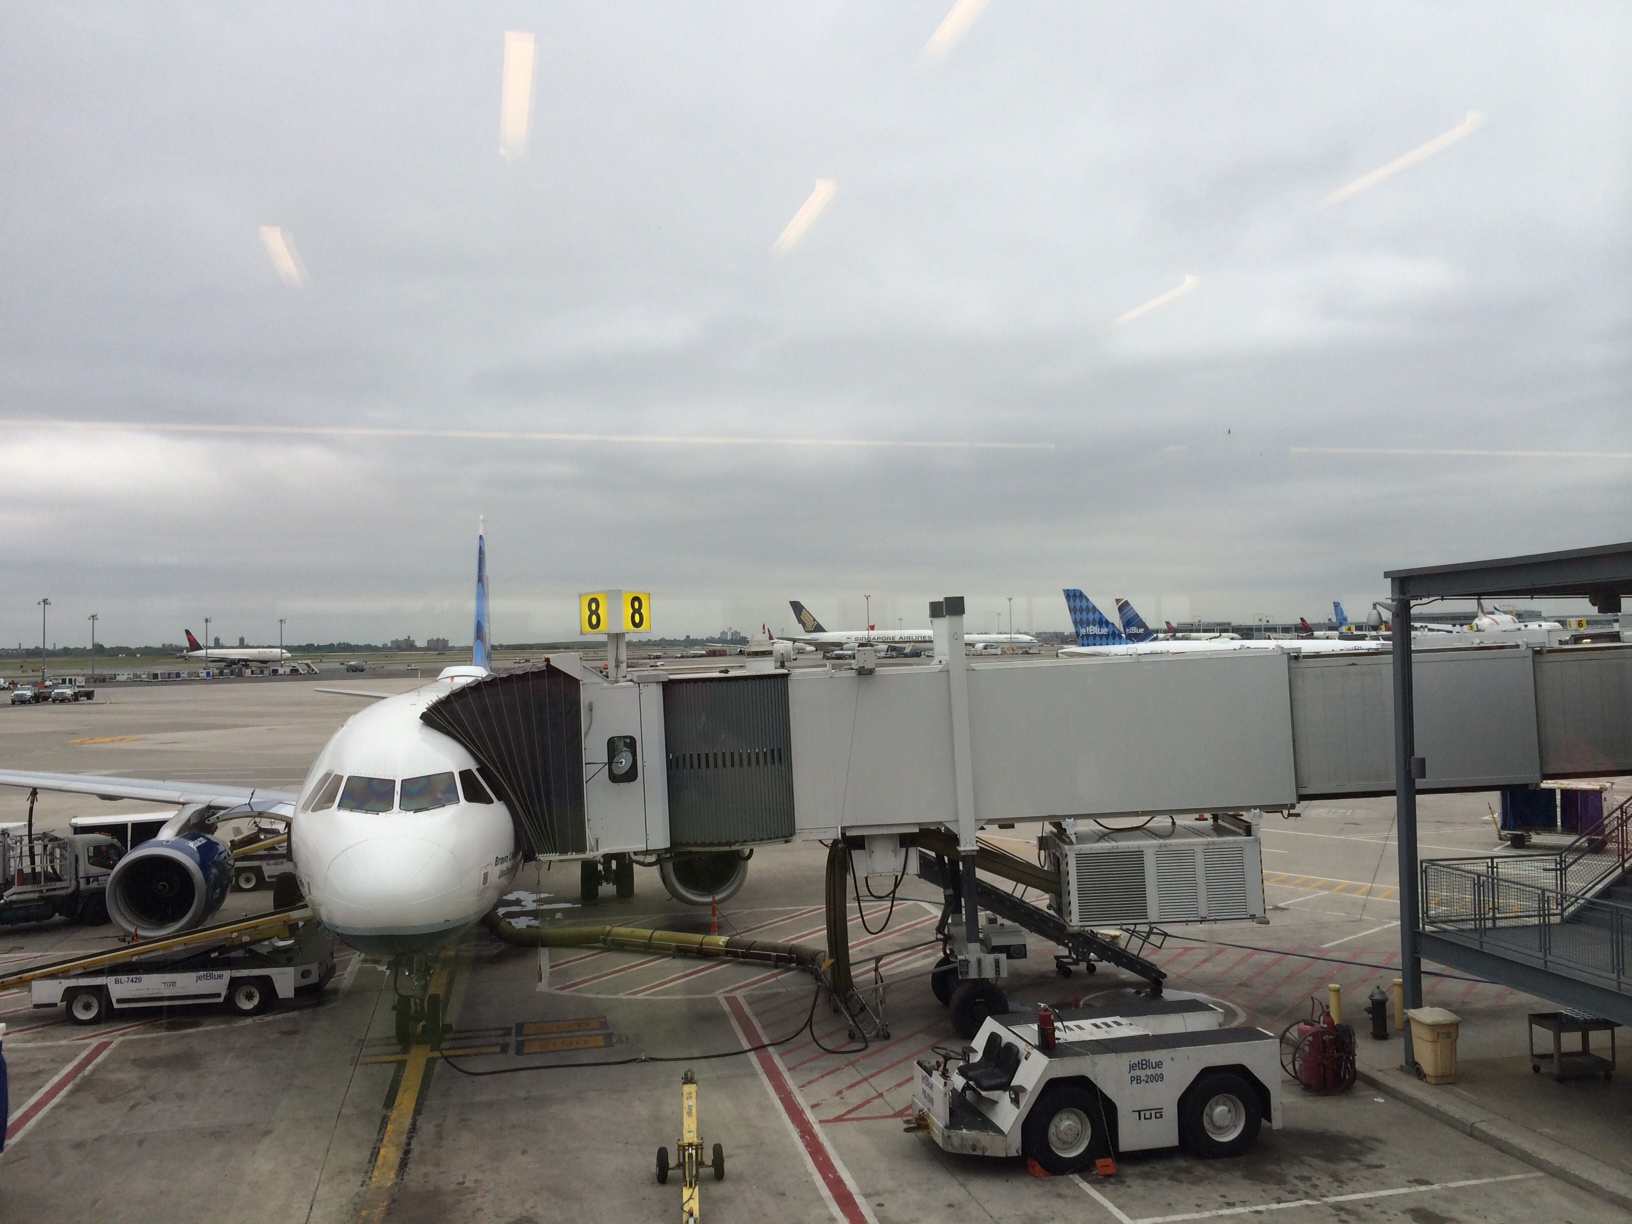 Plane loading